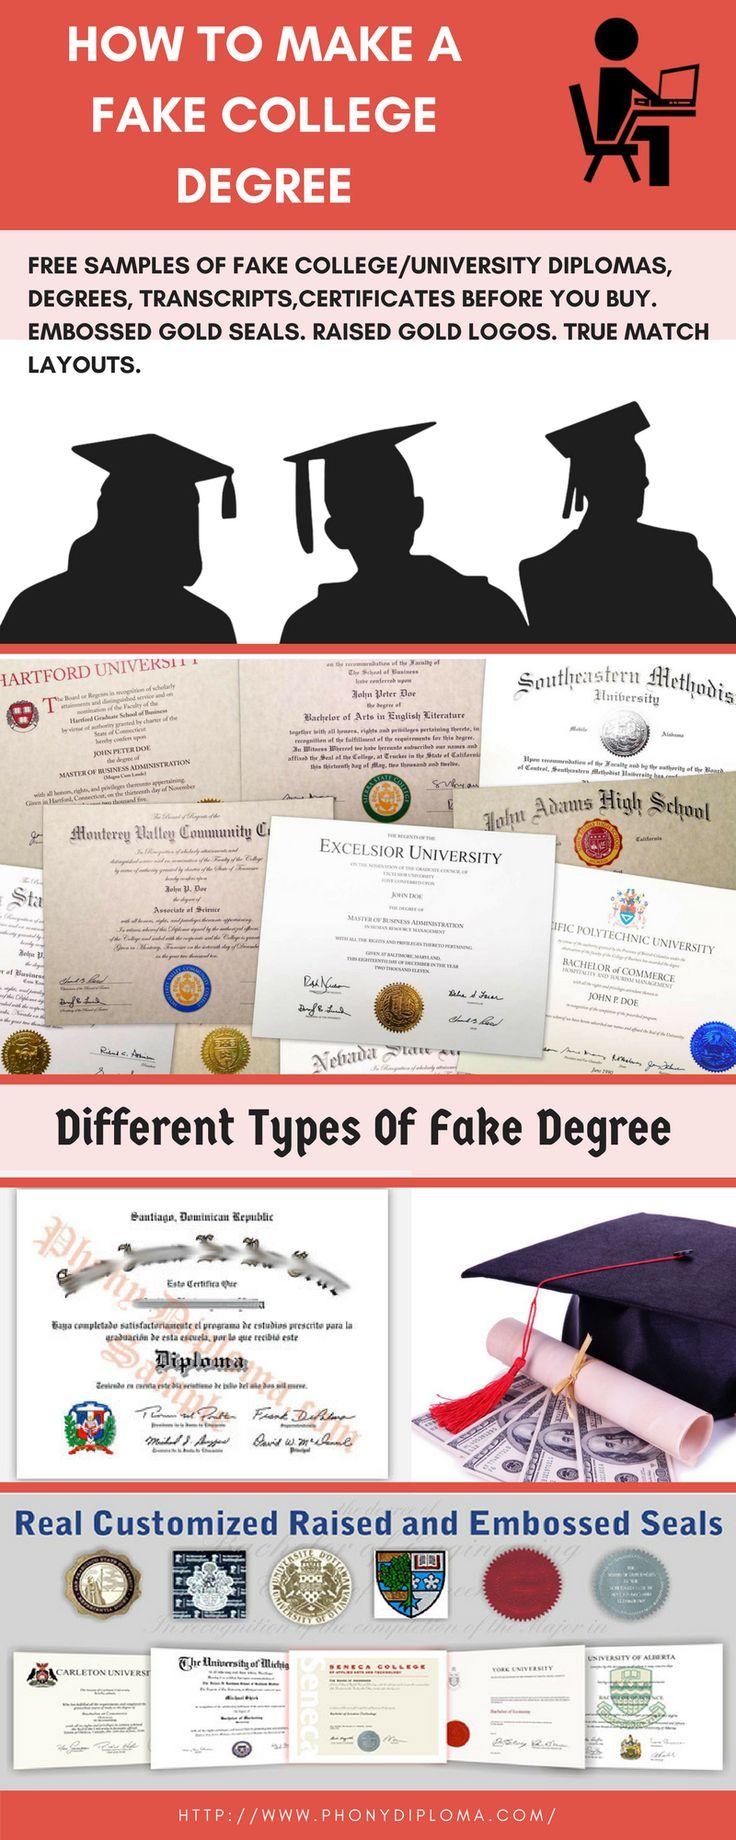 Alumni want to order a duplicate diploma that says thomas edison - Buy Fake College Degree Online From Phony Diploma Fake College Degree And University Diplomas And